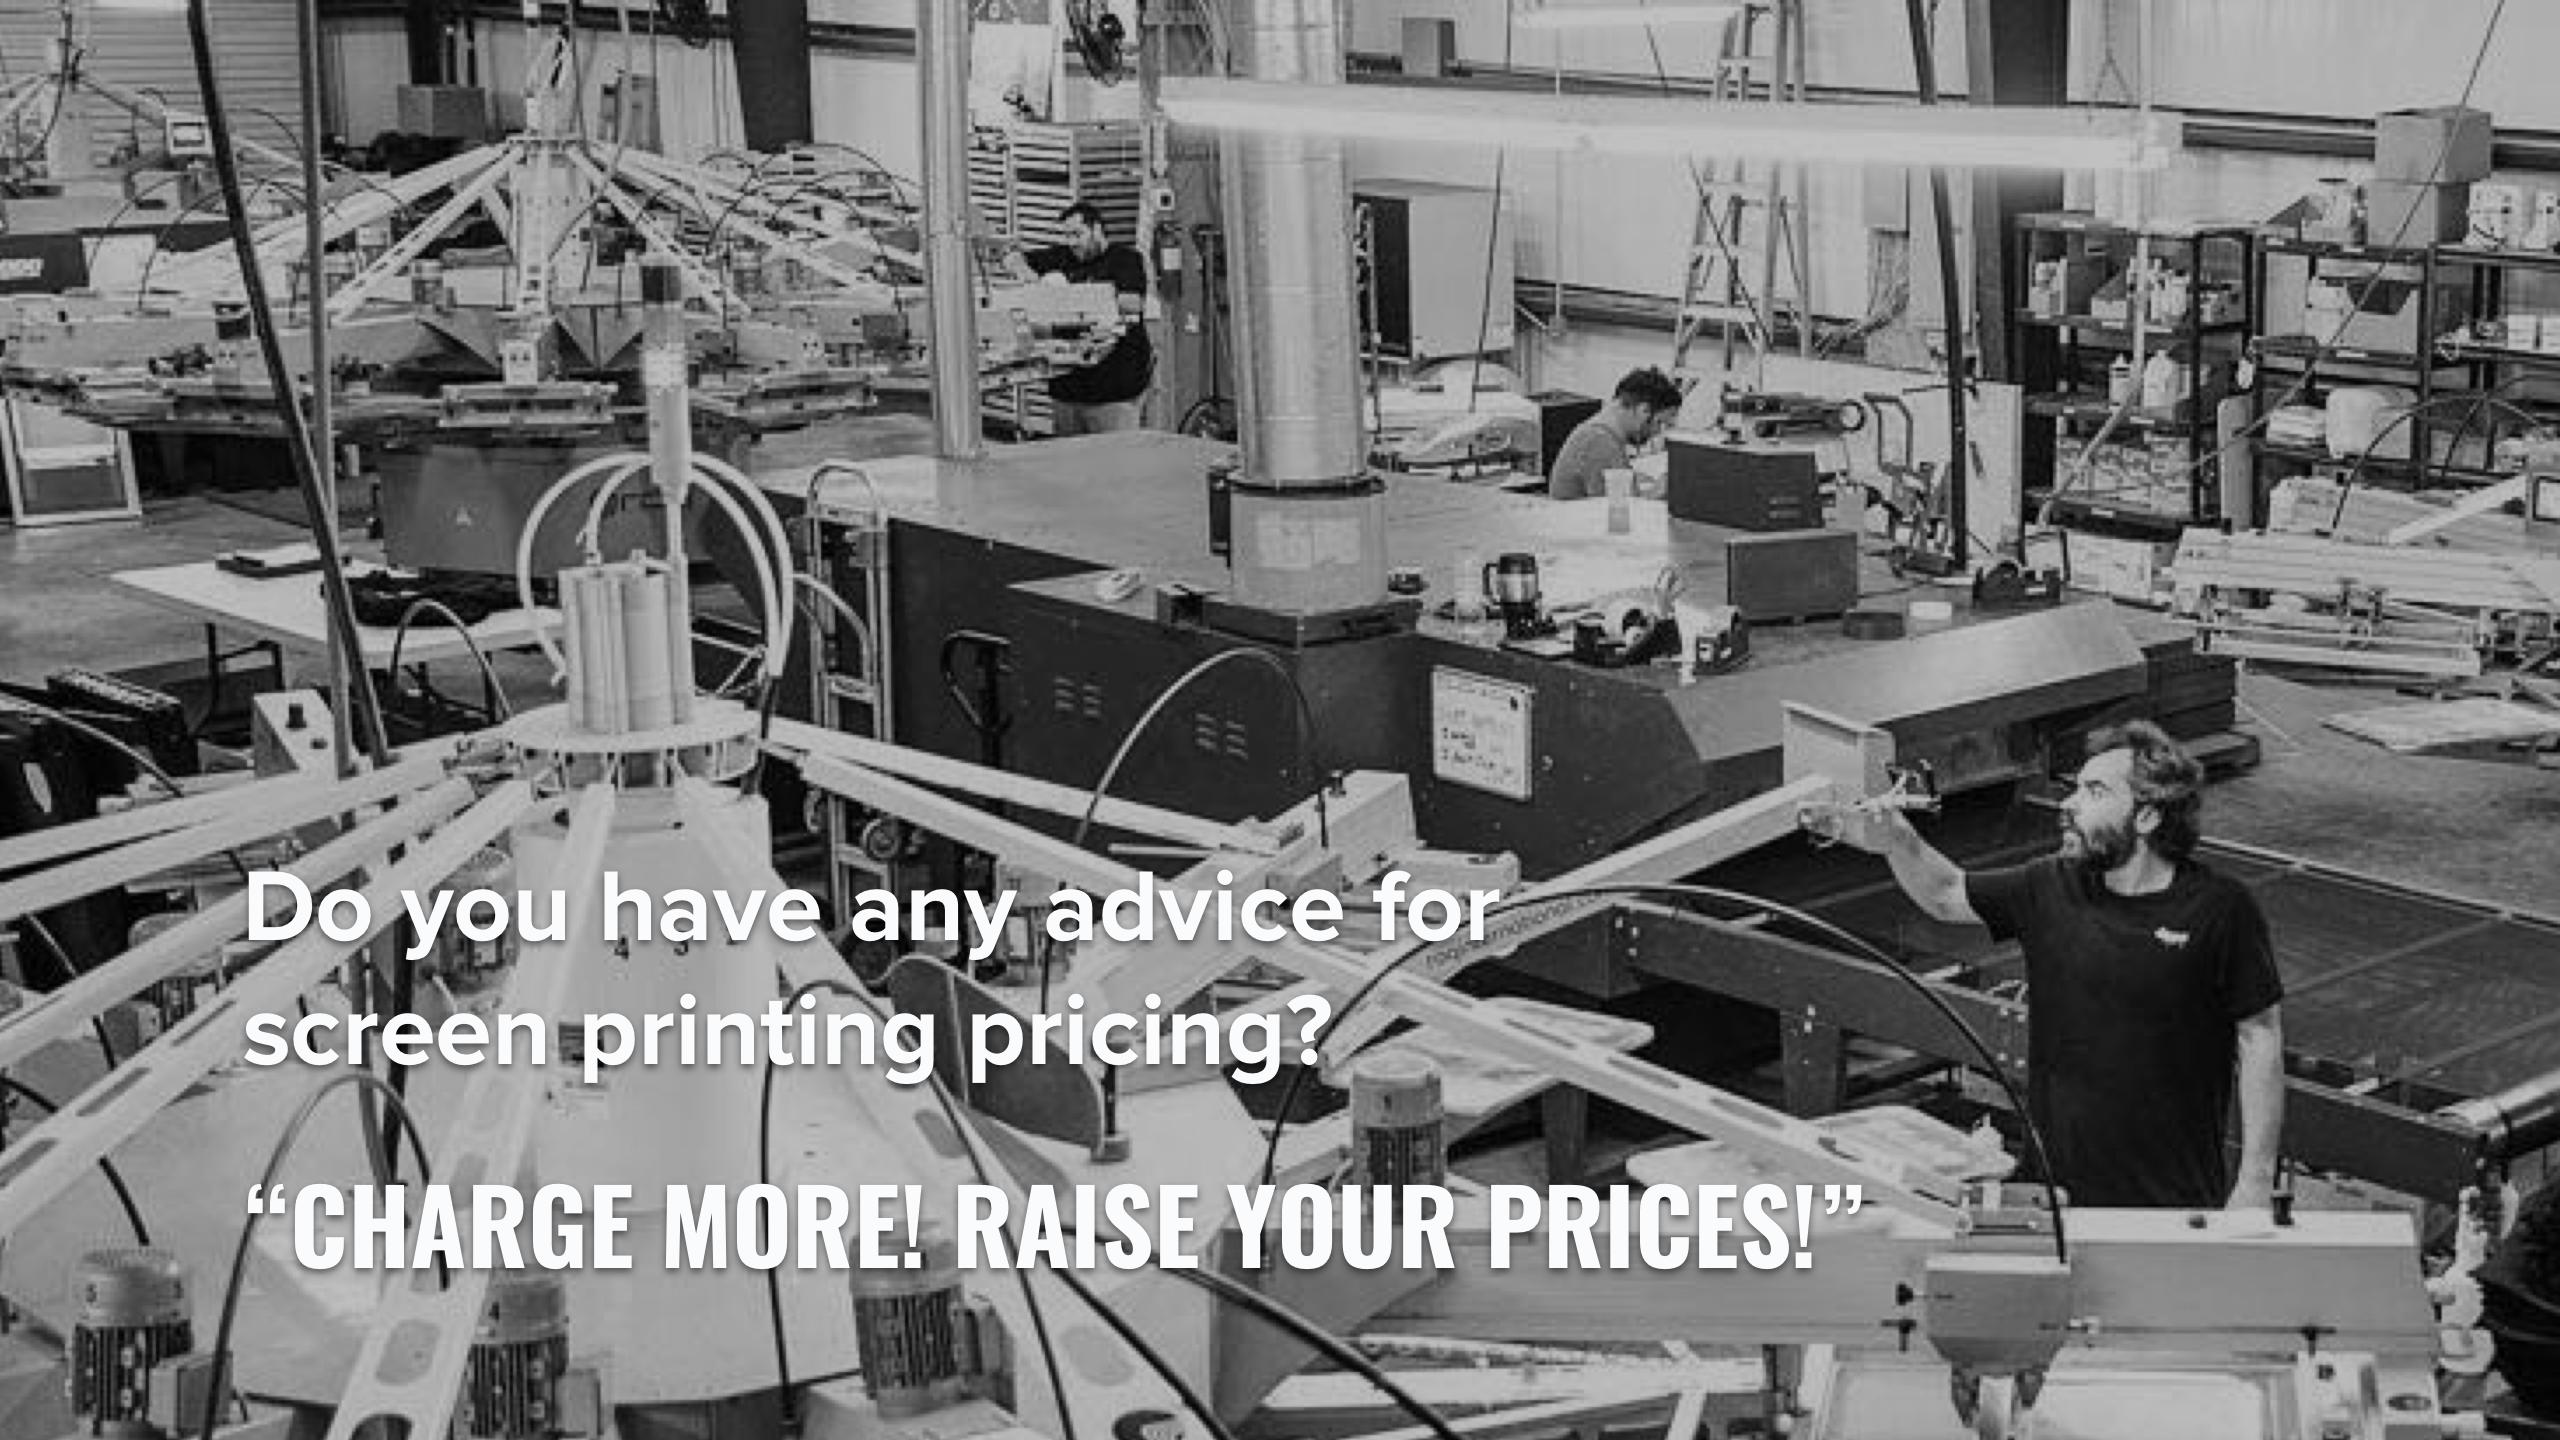 A screen printer operates a large ROQ automatic screen printing press.